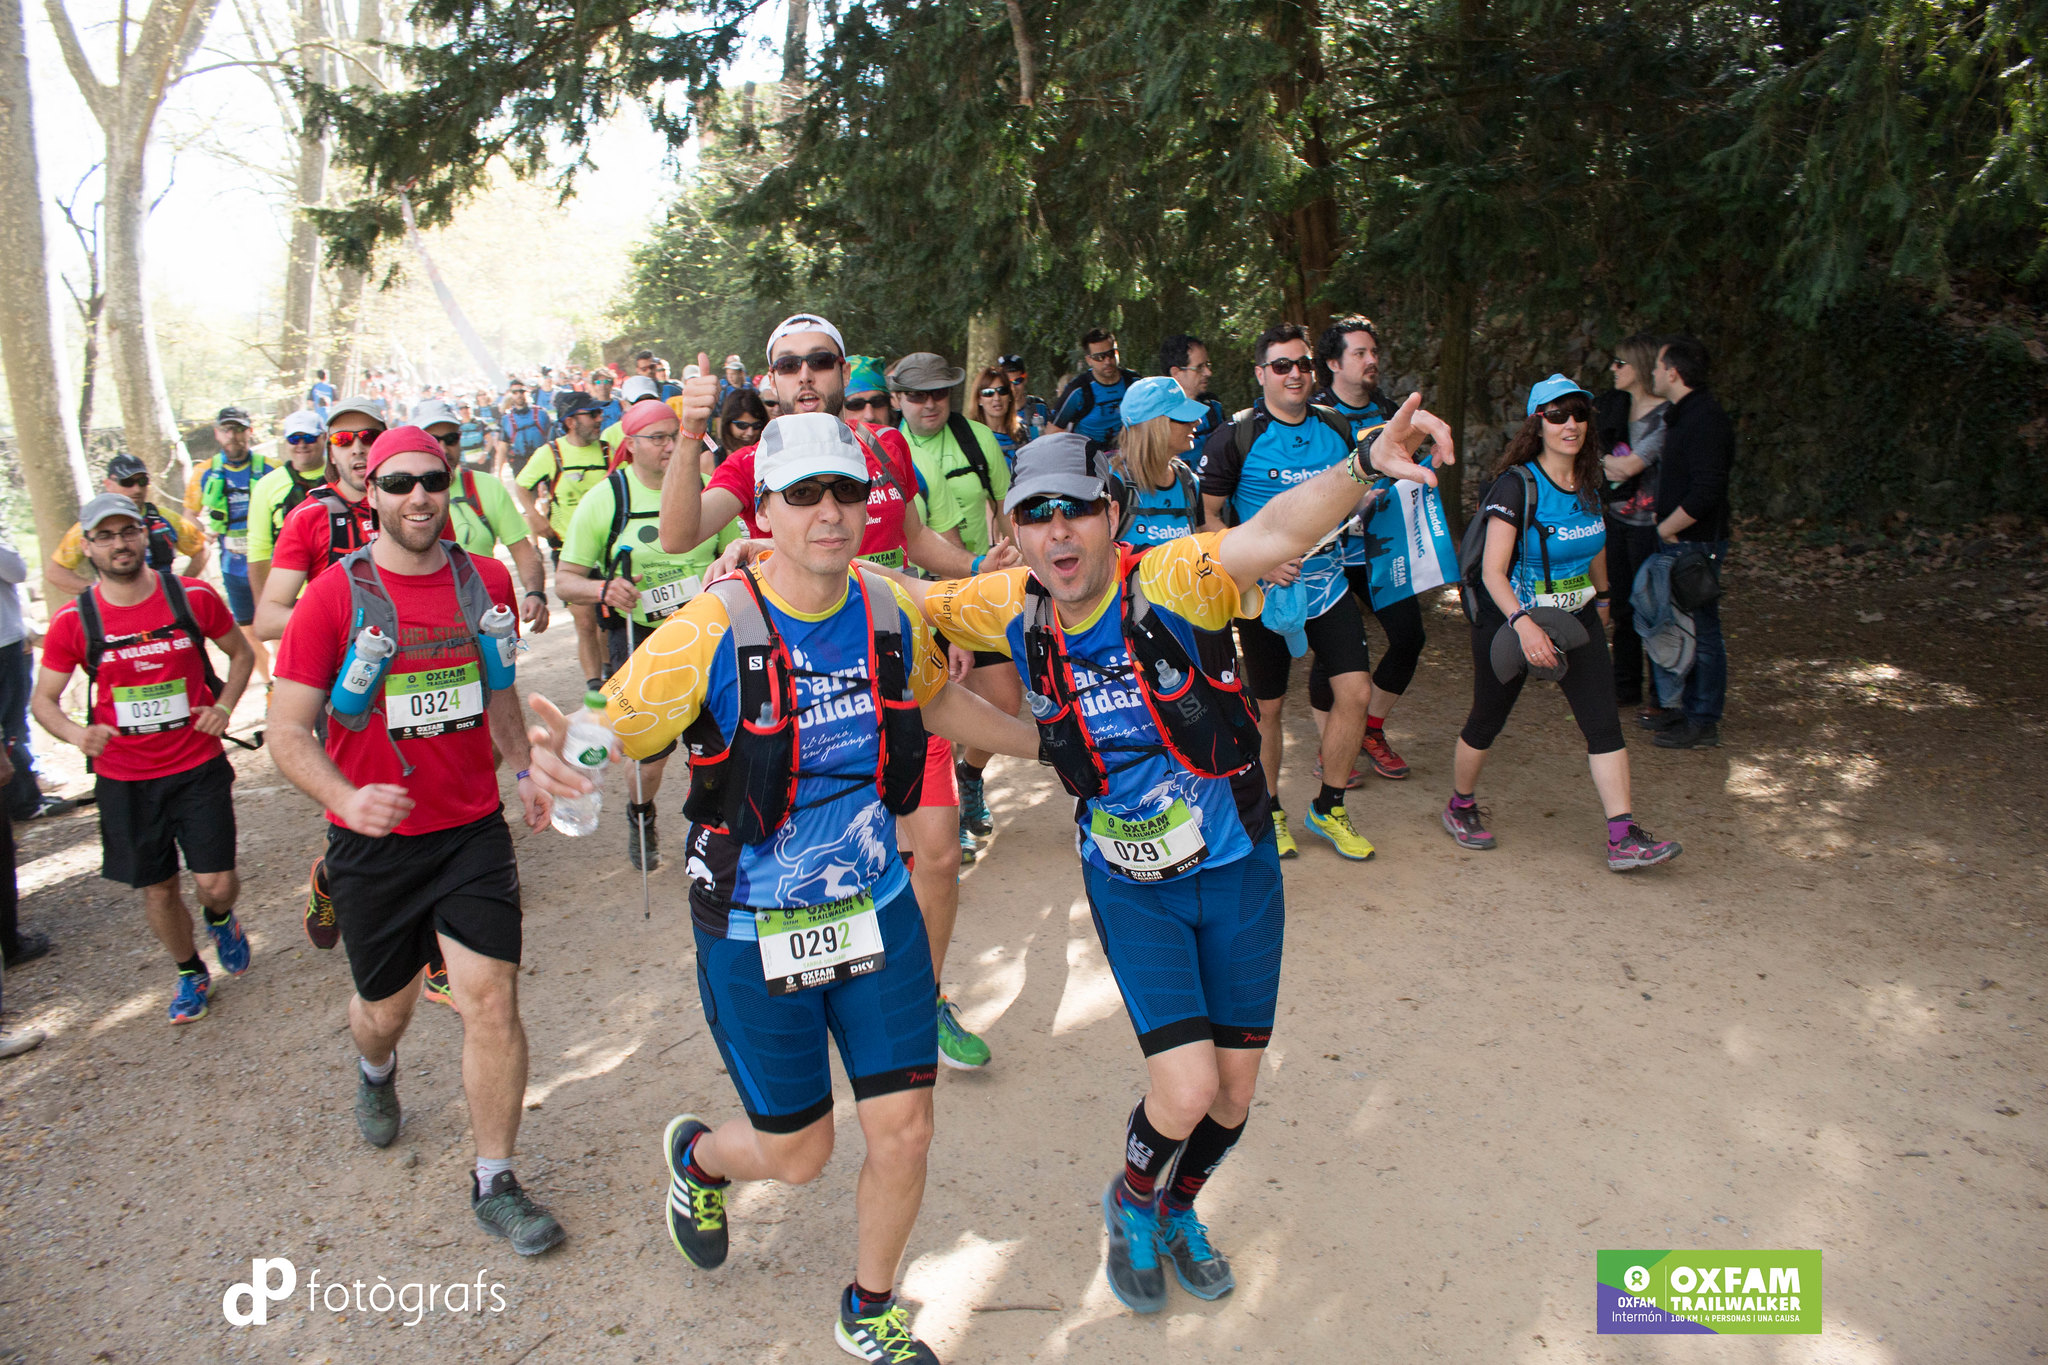 Oxfam Trailwalker 2016 Girona